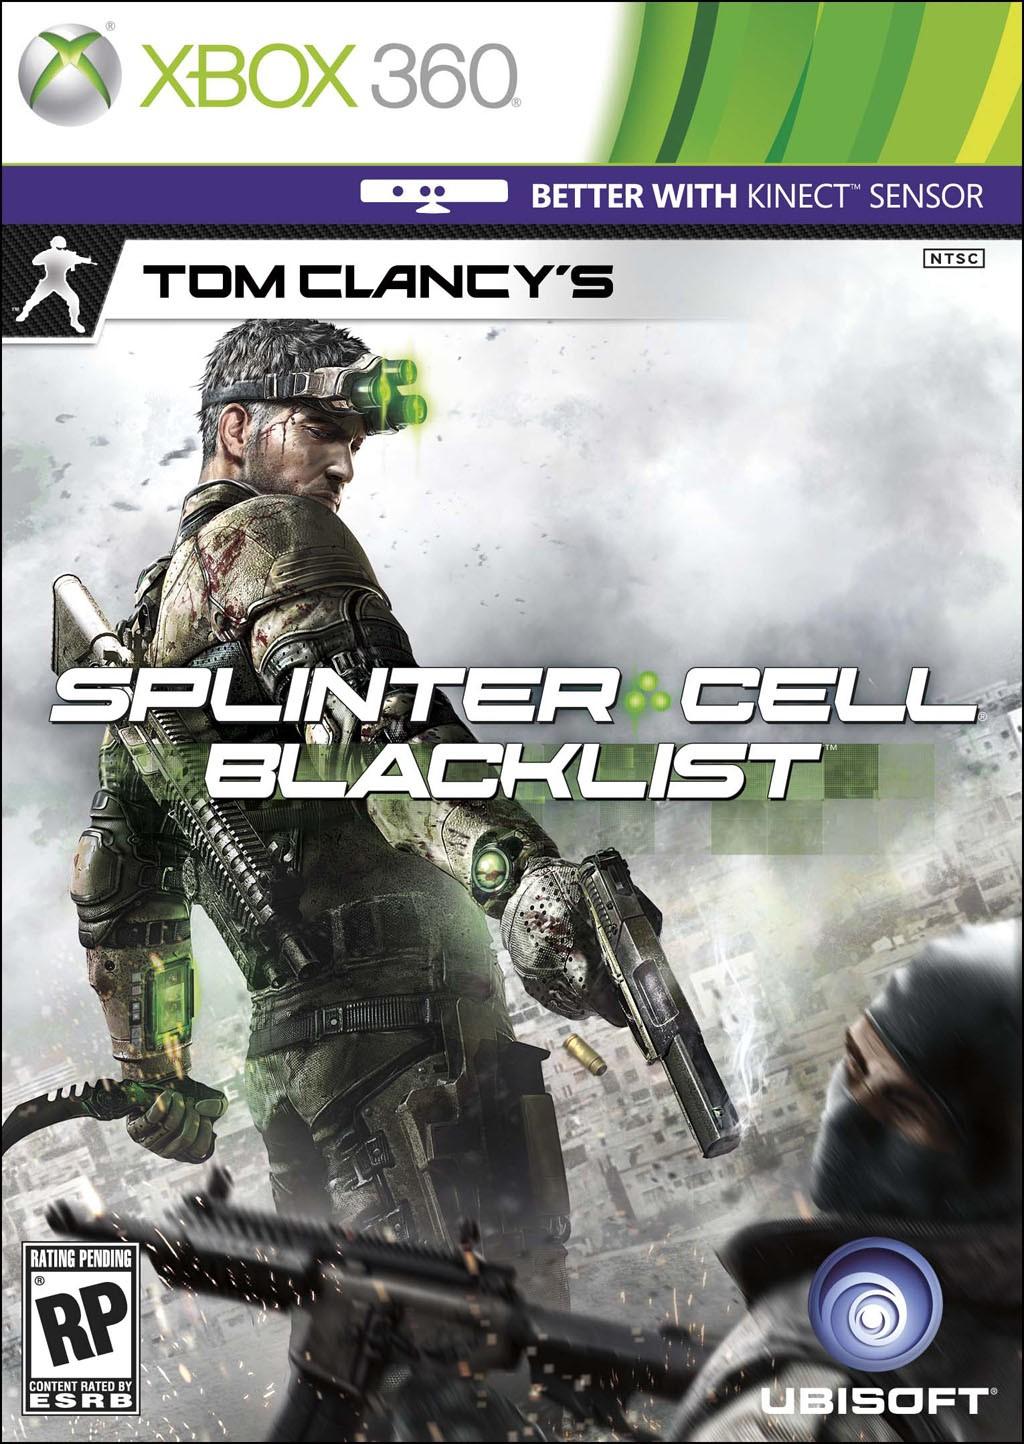 Tom Clancy's: Splinter Cell Blacklist Torrent XBOX 360 PS3